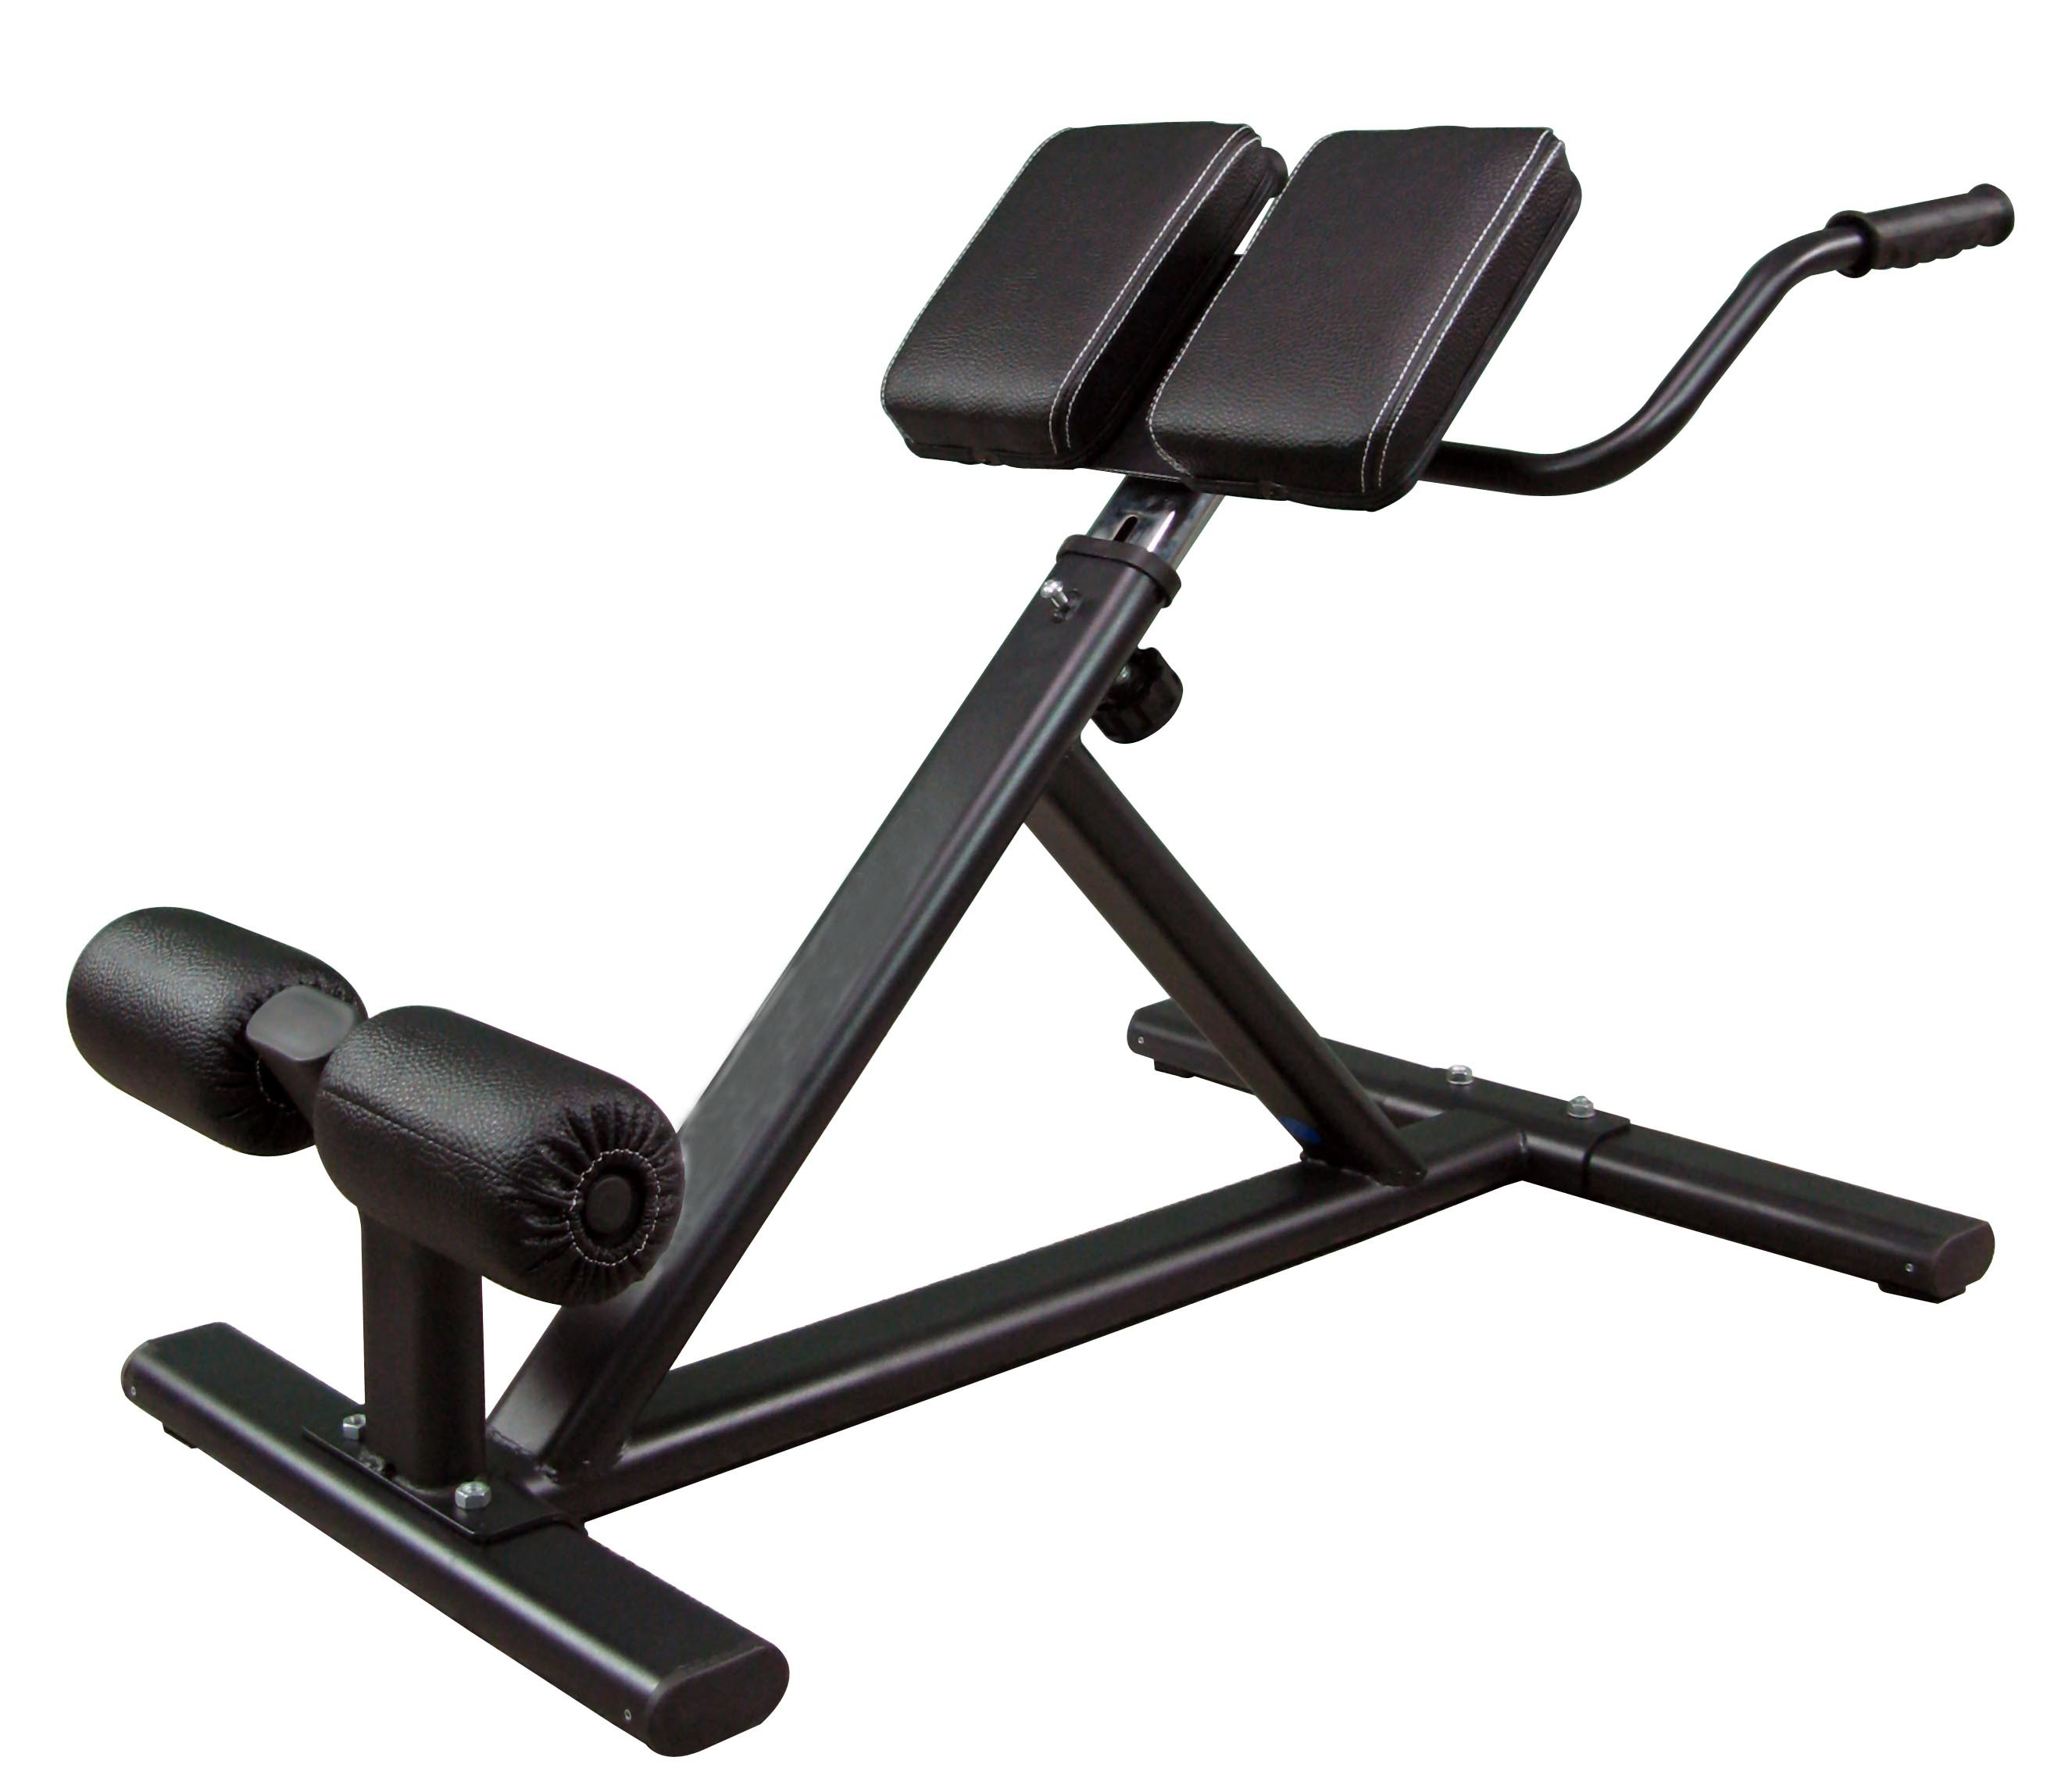 chair gym exercise system costco stadium luxury roman workout rtty1